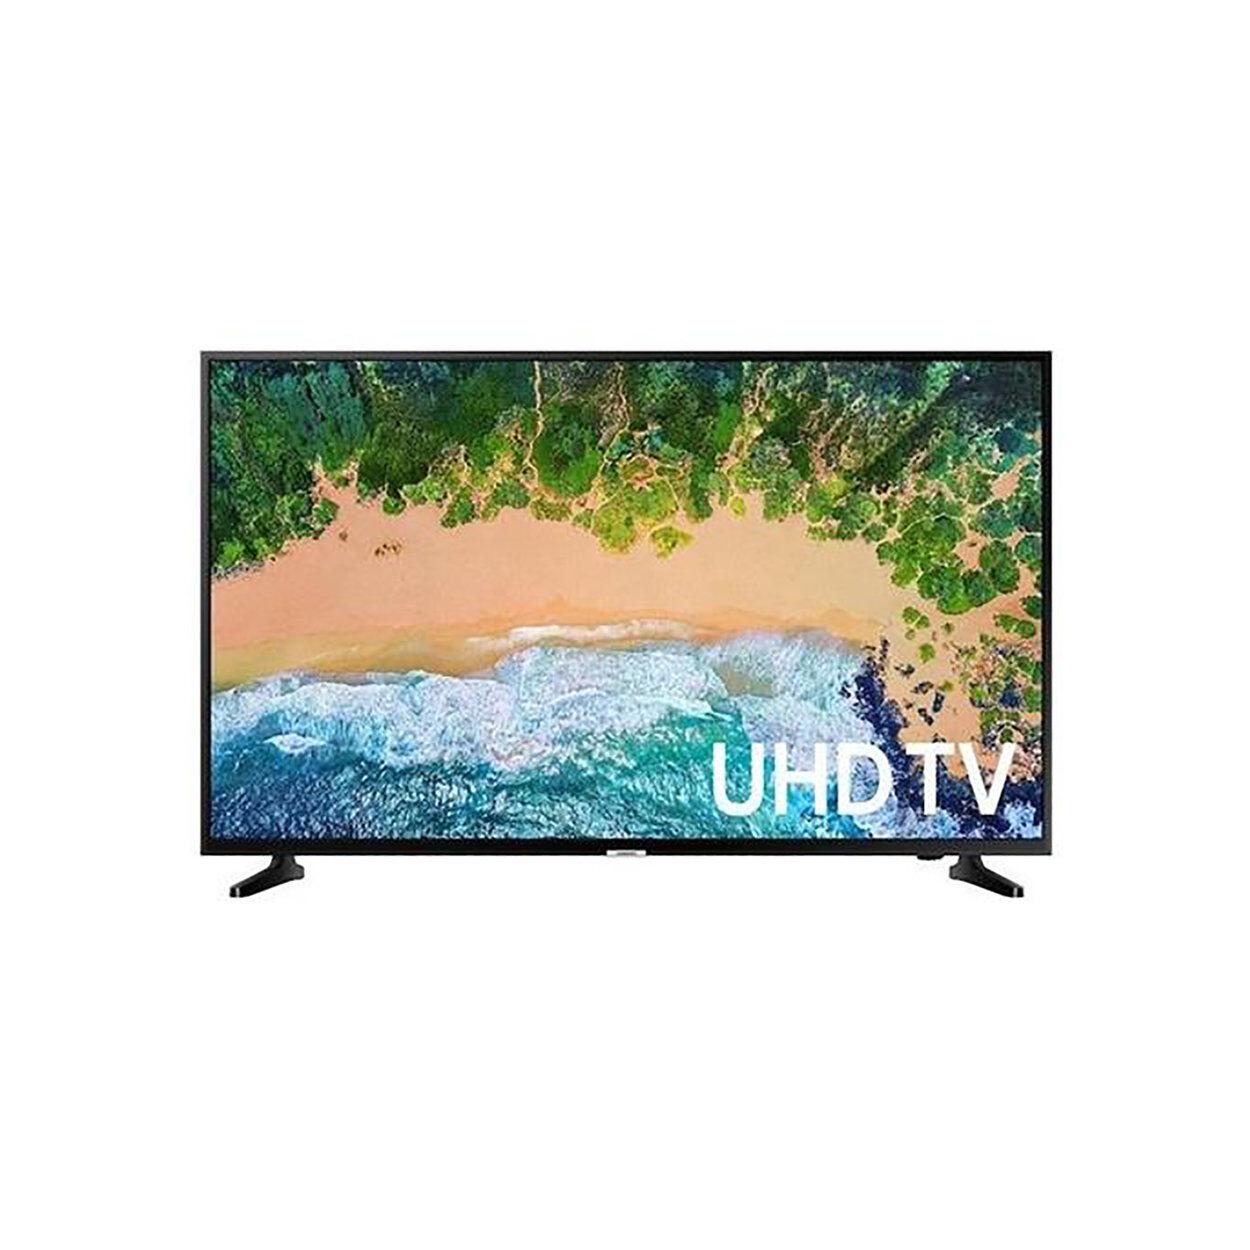 "Speciale TV TV LED SAMSUNG 55"" UHD 4K 55RU7172"